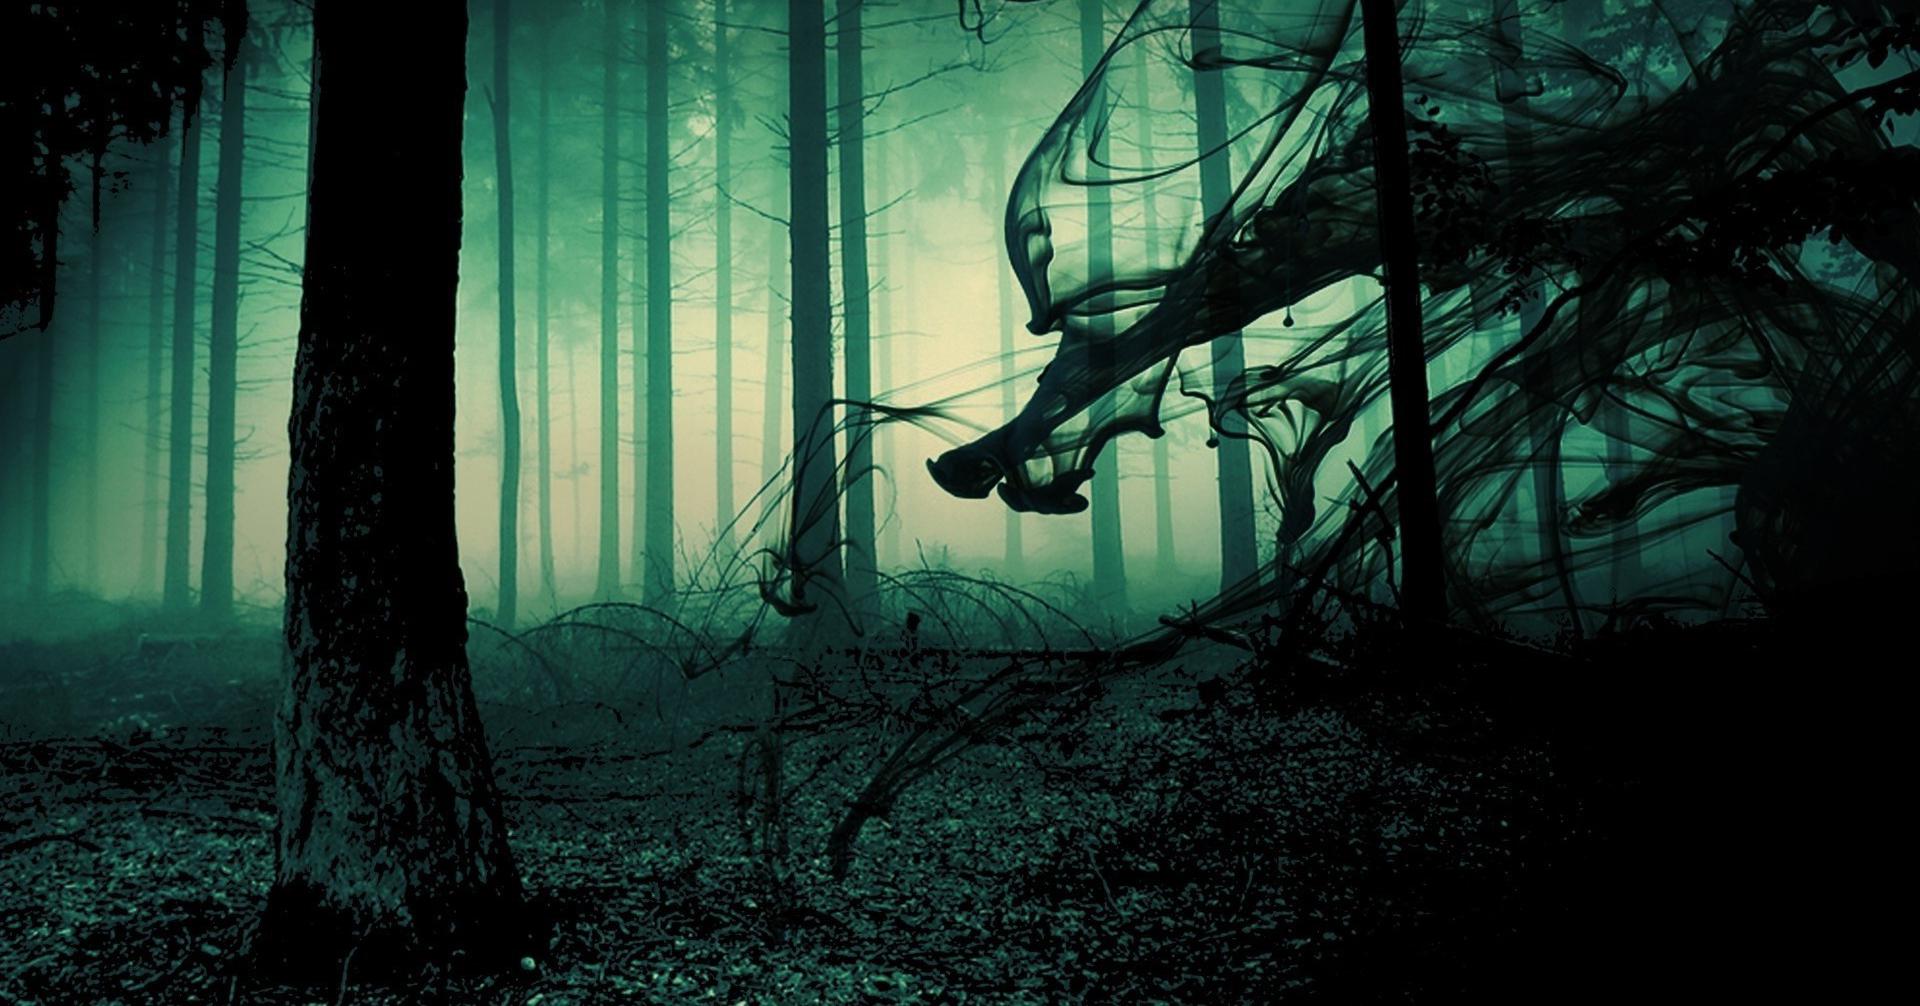 creepyforest.png.7dc8f2c3e16eecb7d3e60abd903f13f6.png